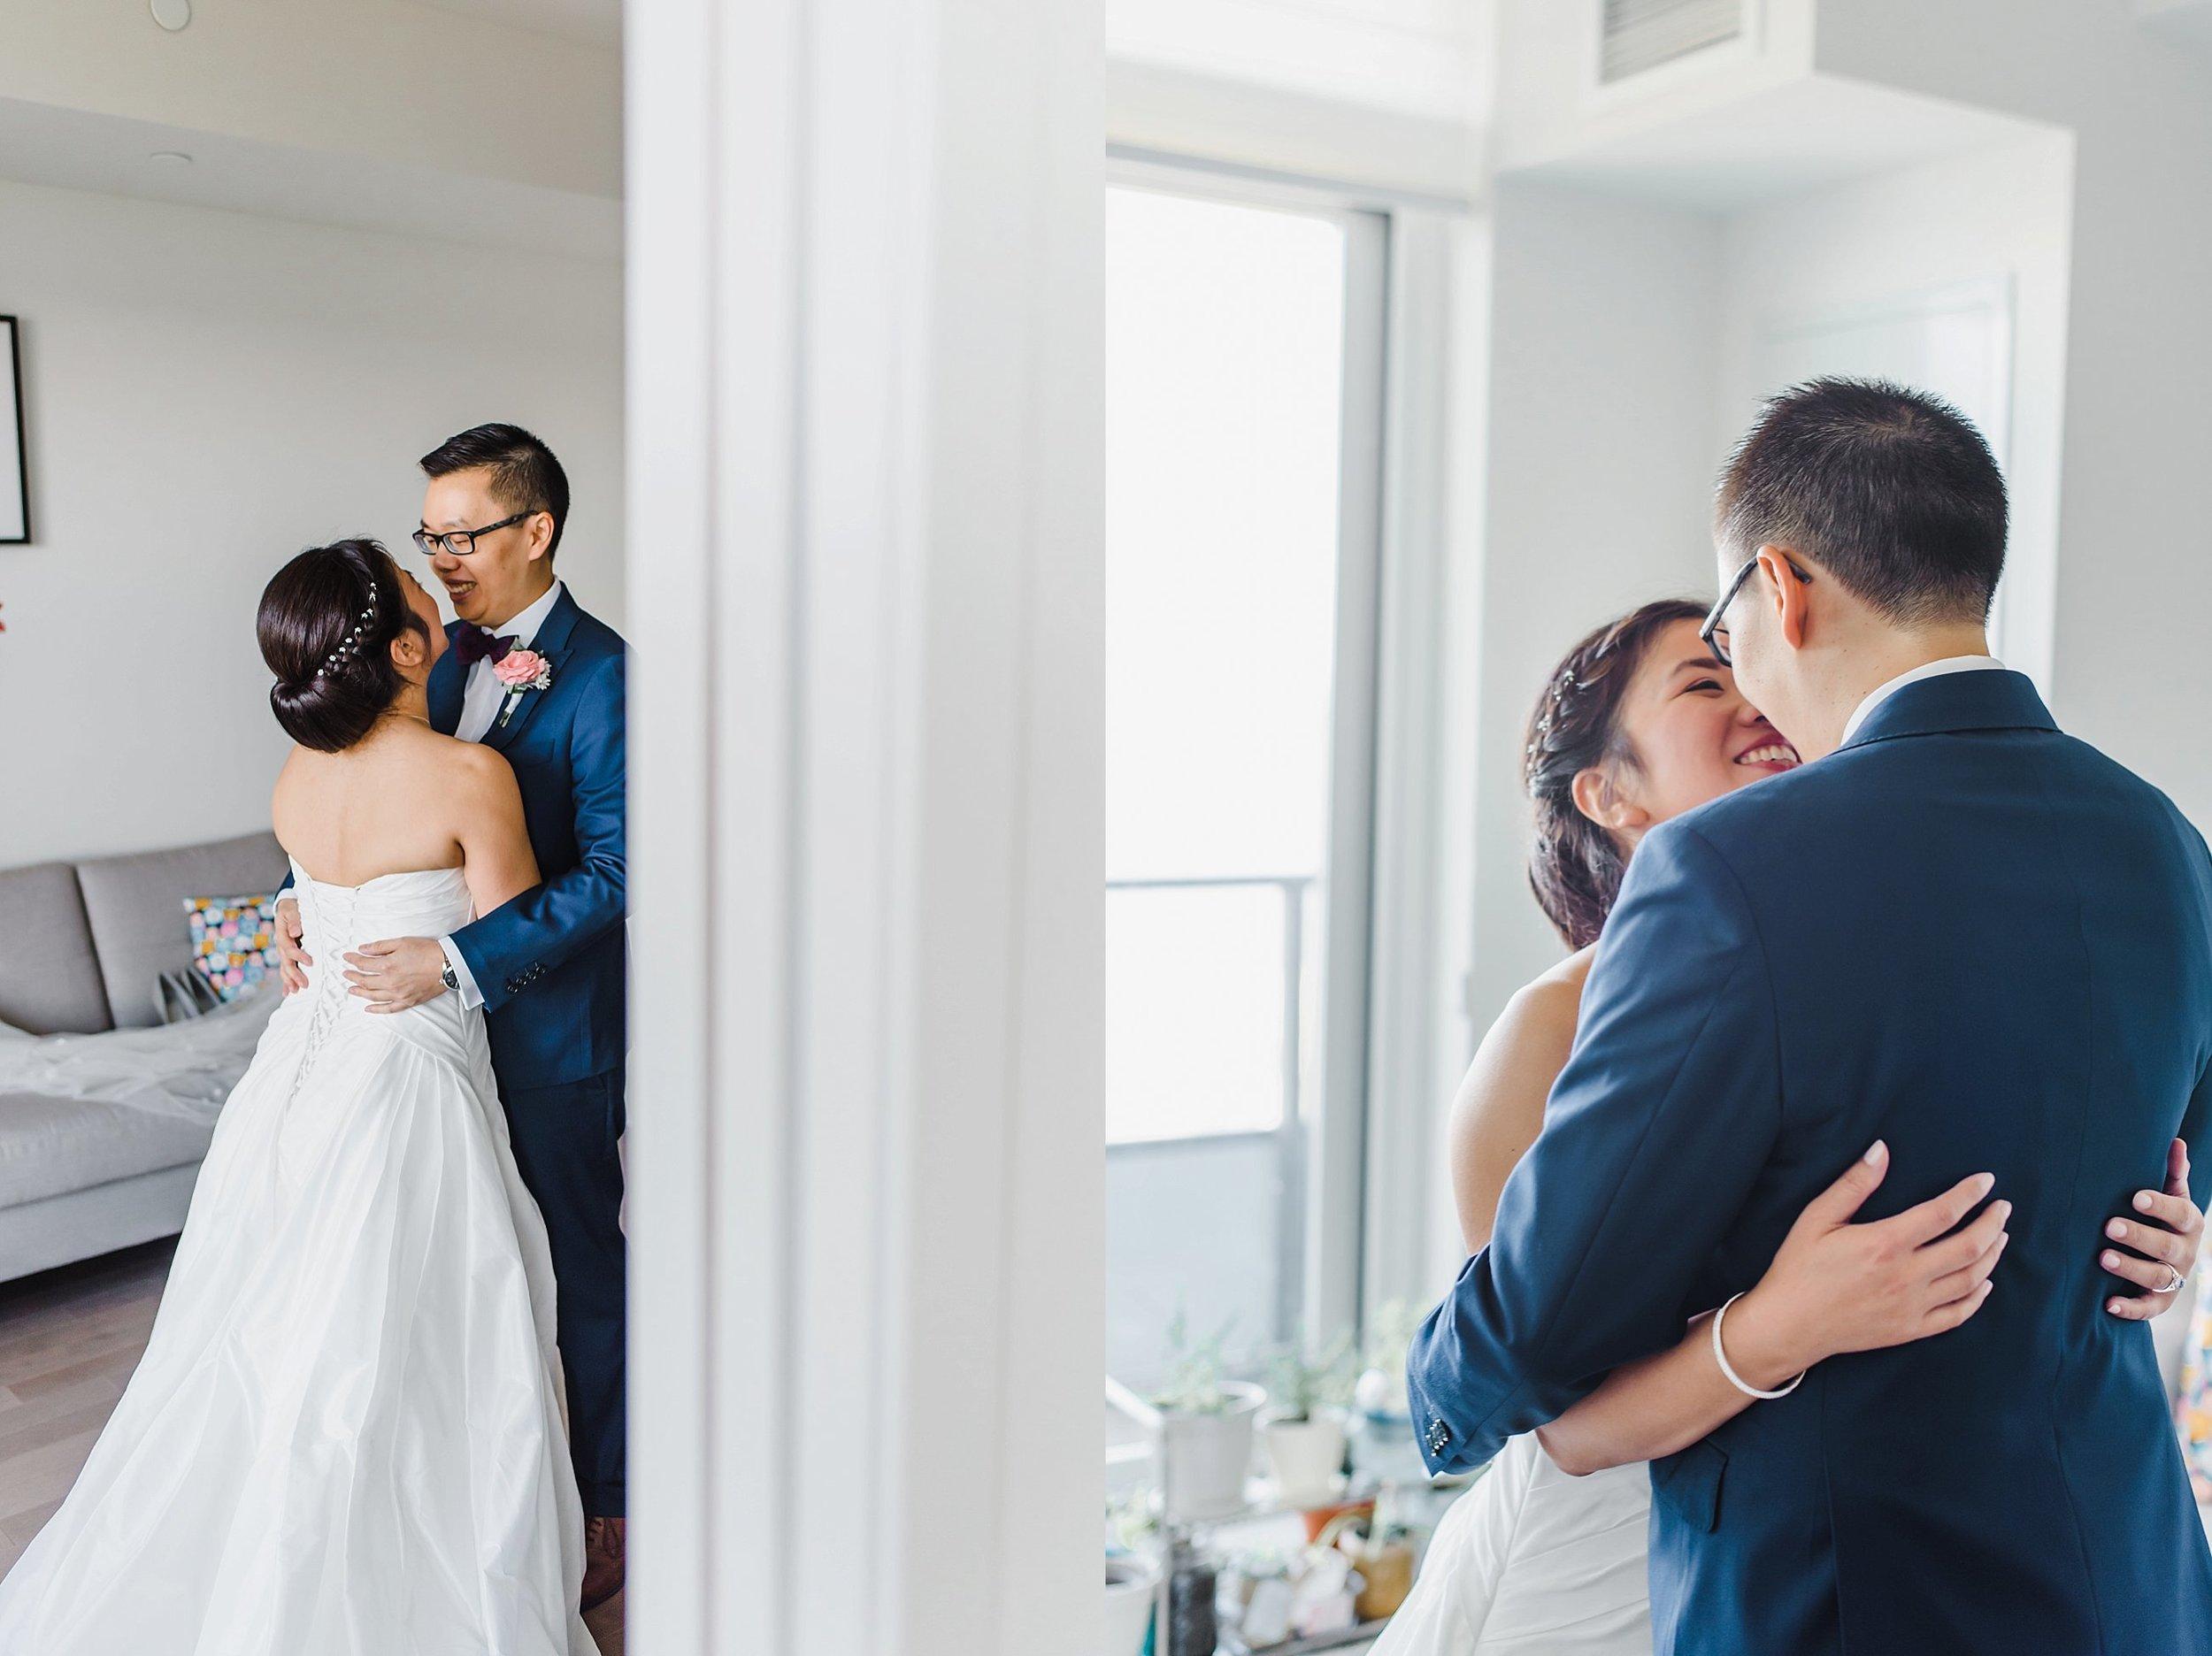 light airy indie fine art ottawa wedding photographer | Ali and Batoul Photography_1475.jpg